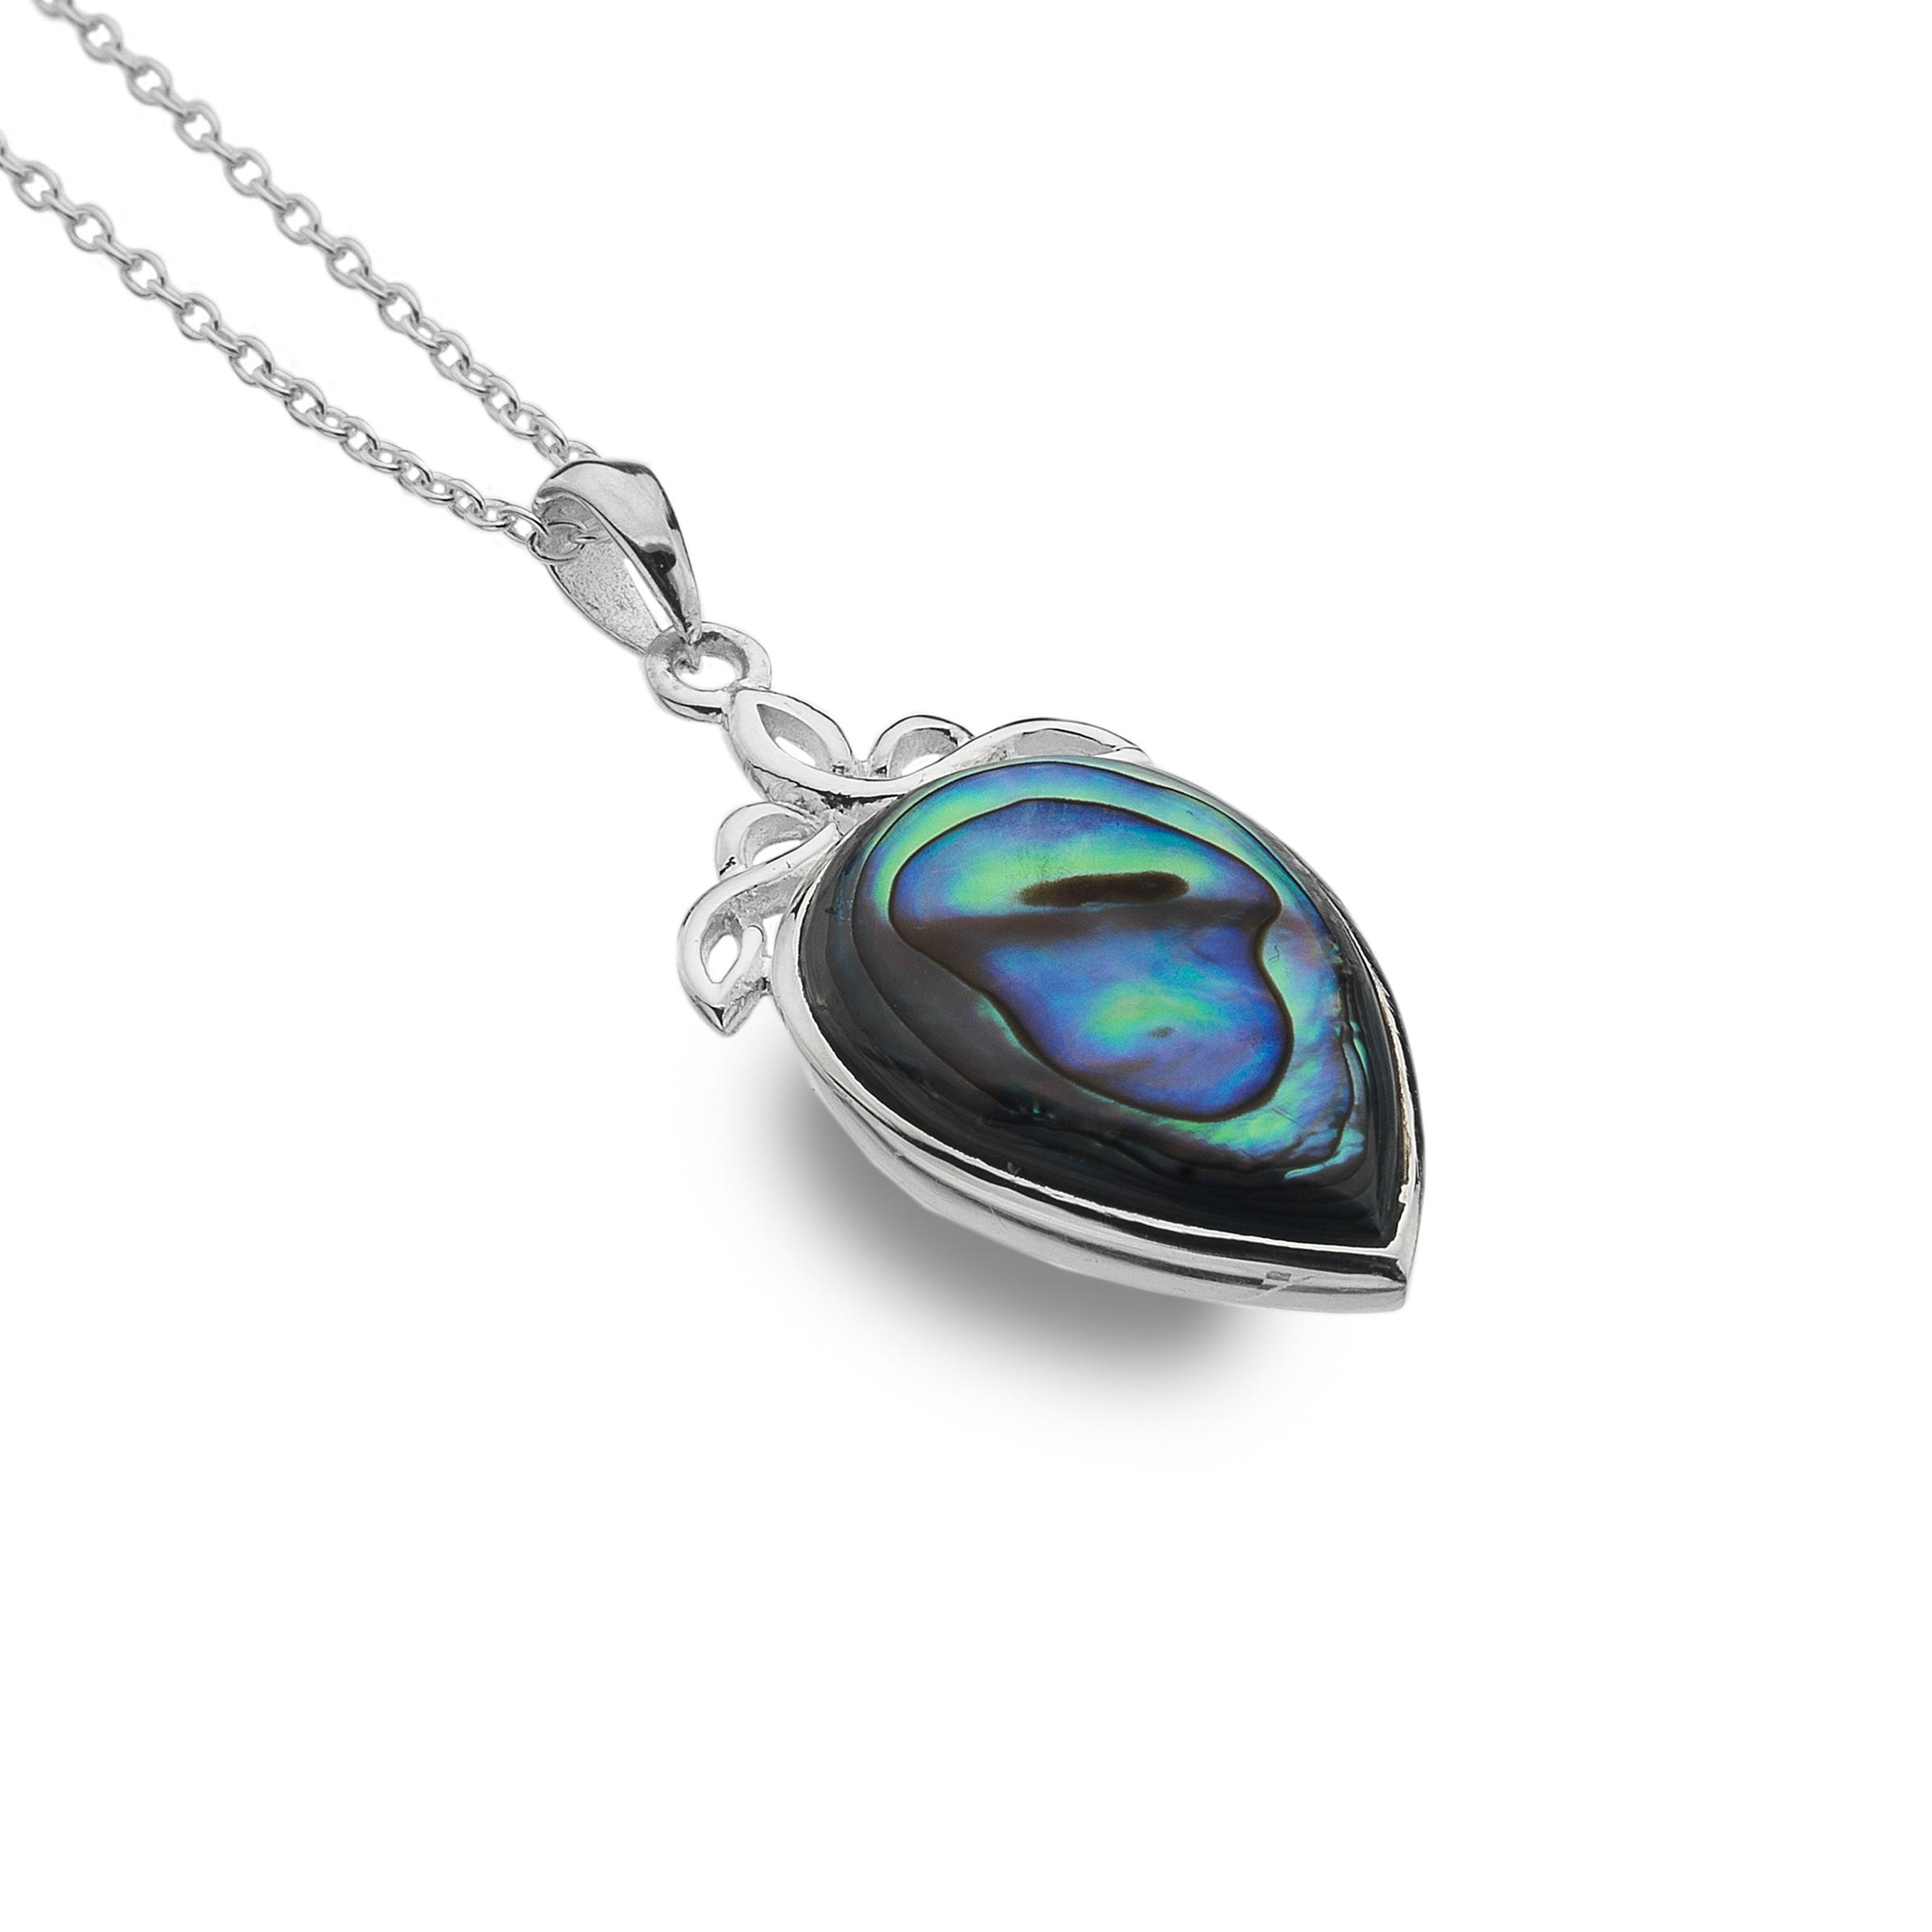 Celtic Knot Sterling Silver Pendant Necklace